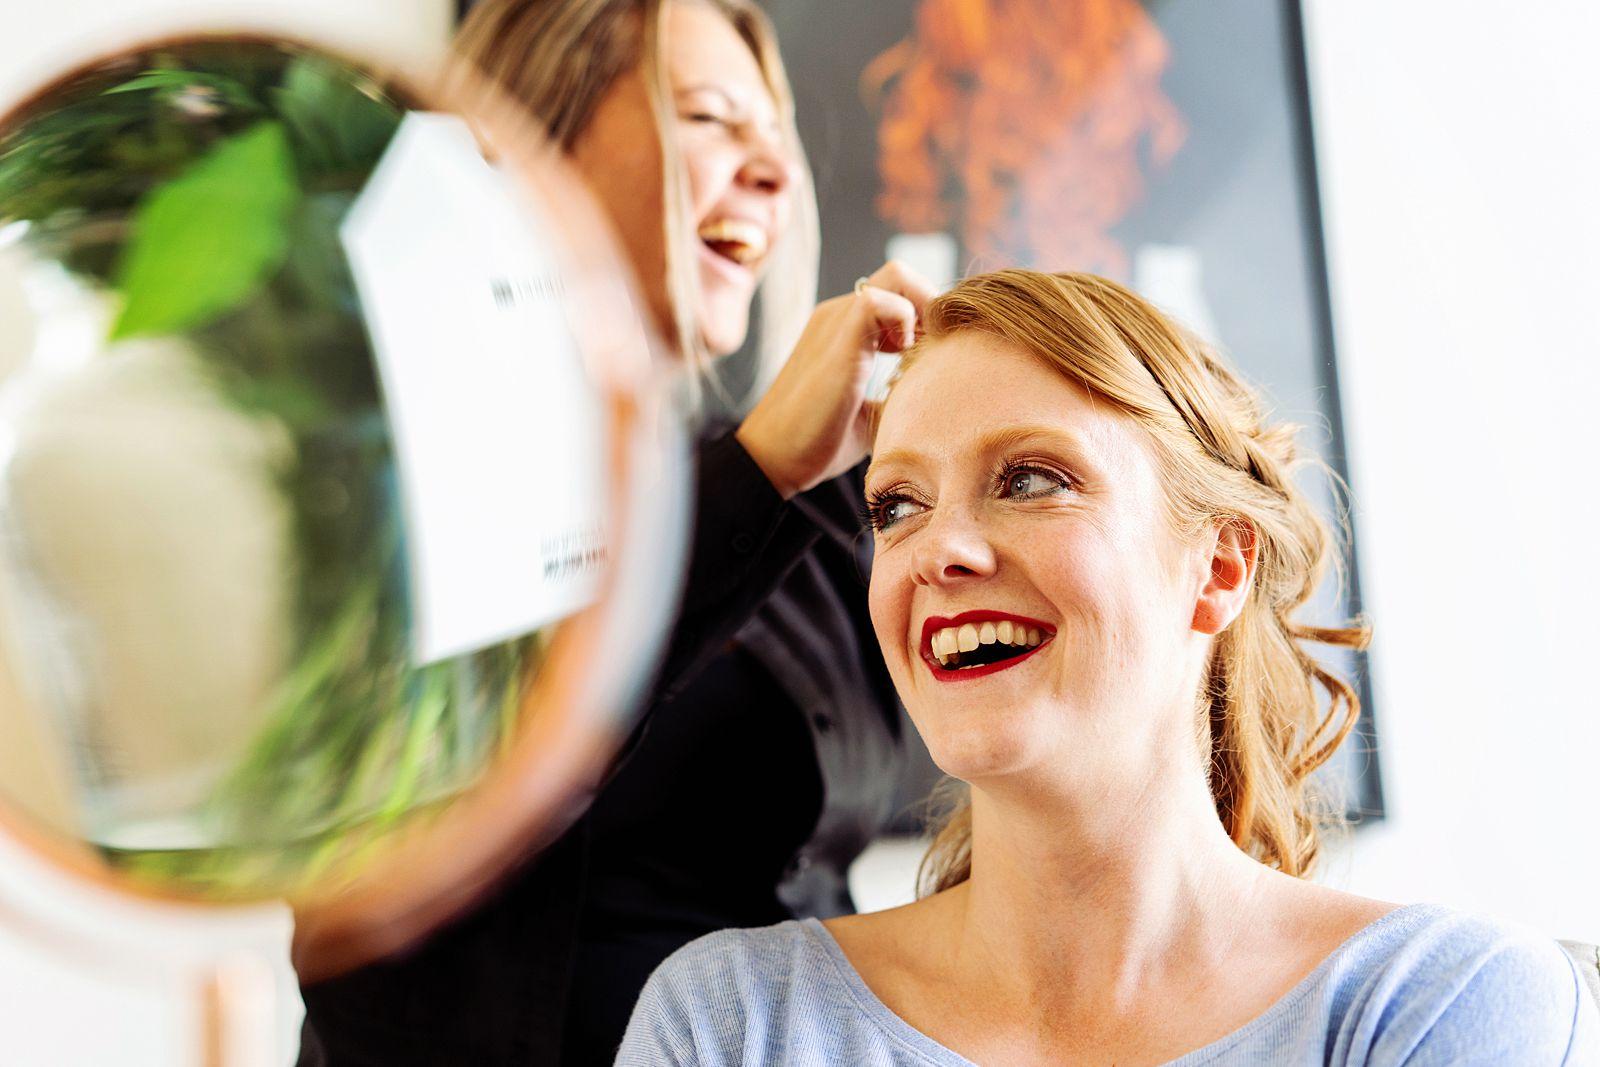 ruudc fotografie, trouwfotograaf leiden, bruidsfotograaf leiden, bruidsfotograaf zuid-holland, trouwen hortus botanicus, hortus botanicus leiden, trouwen in leiden, bruiloft hortus botanicus, trouwen in zuid-holland, fotograaf Leiden, bruiloft hortus botanicus, Fotograaf bruiloft, fotograaf huwelijk